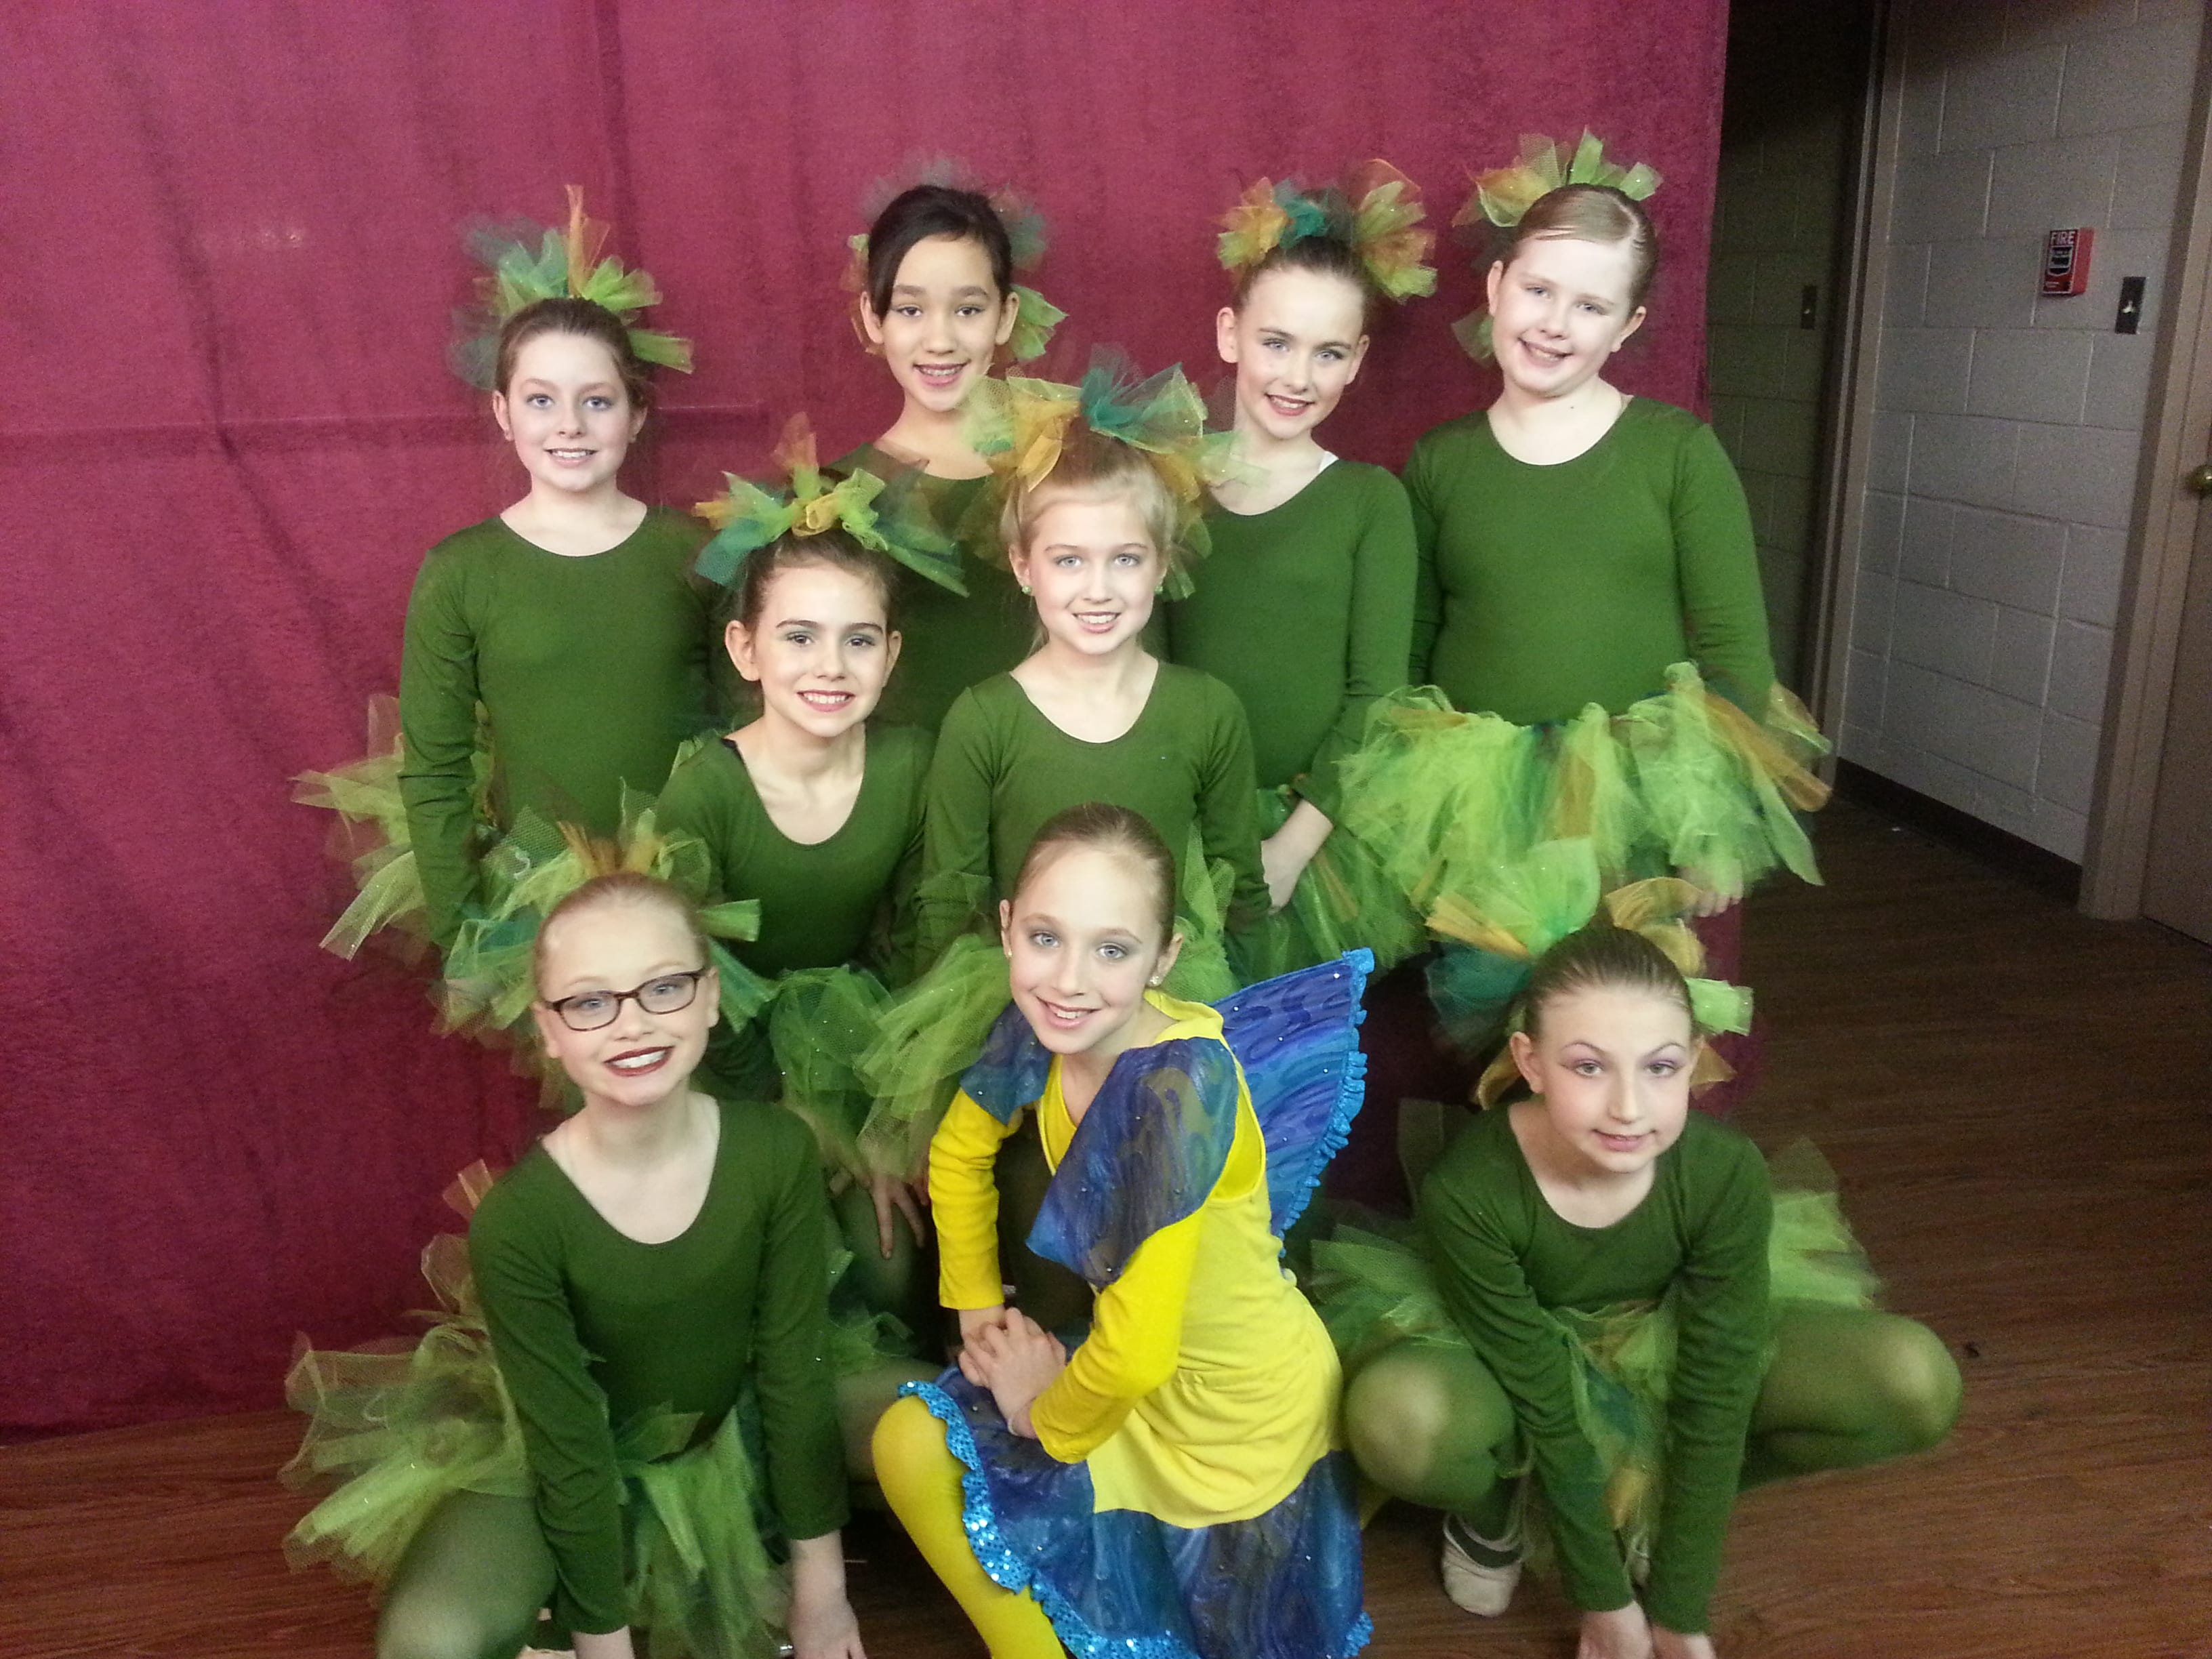 20130317_133041 – Beth Fowler School of Dance : Genoa and St. Charles Illinois